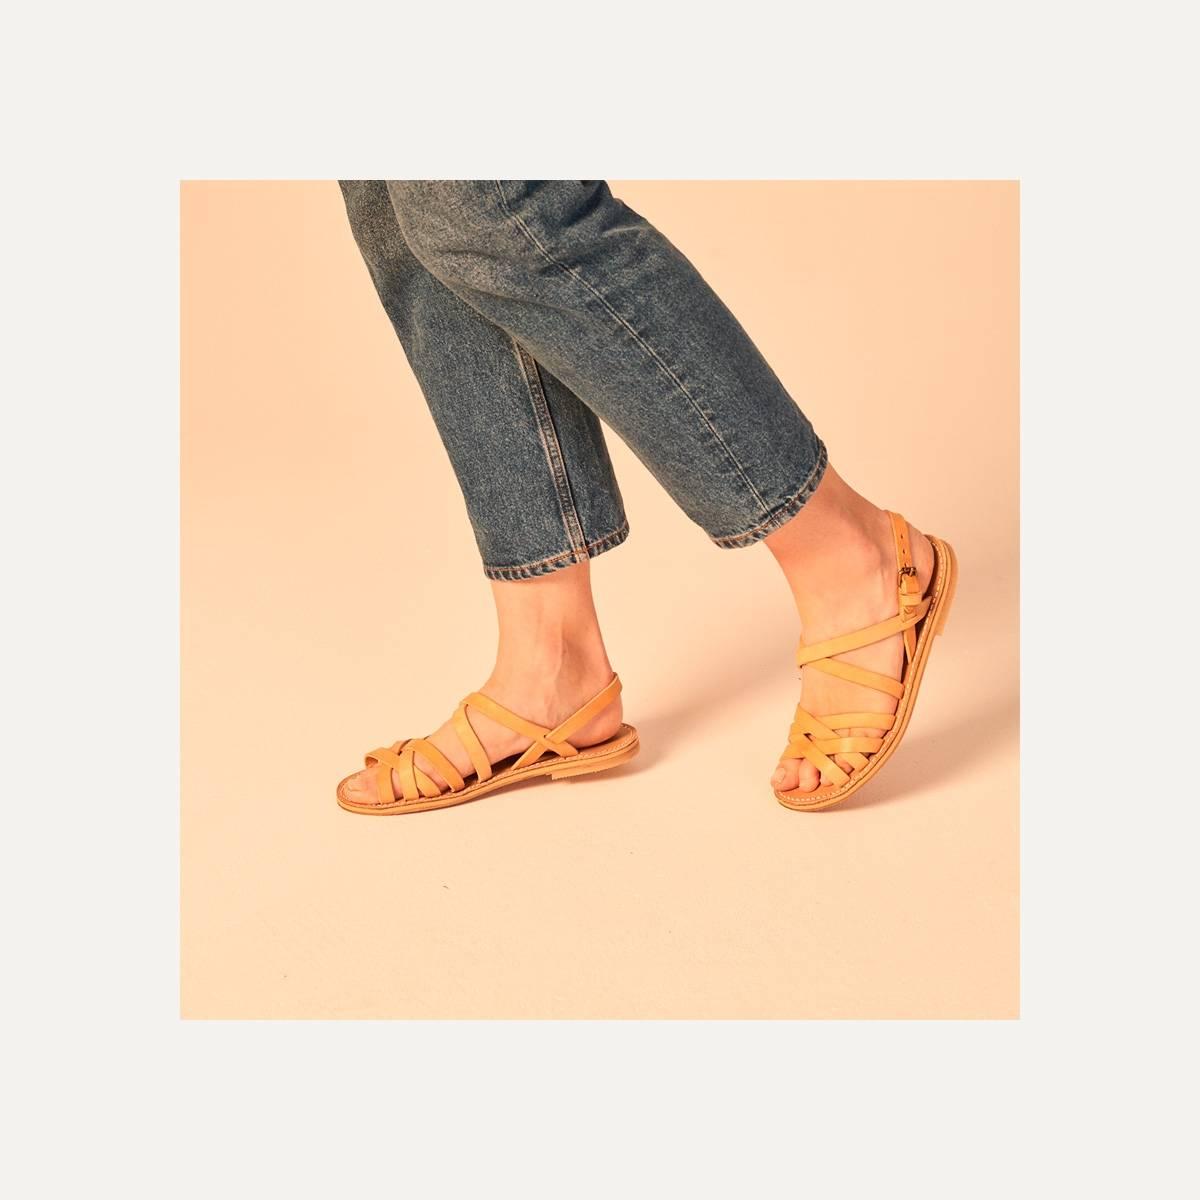 Majour leather sandals - Black (image n°7)